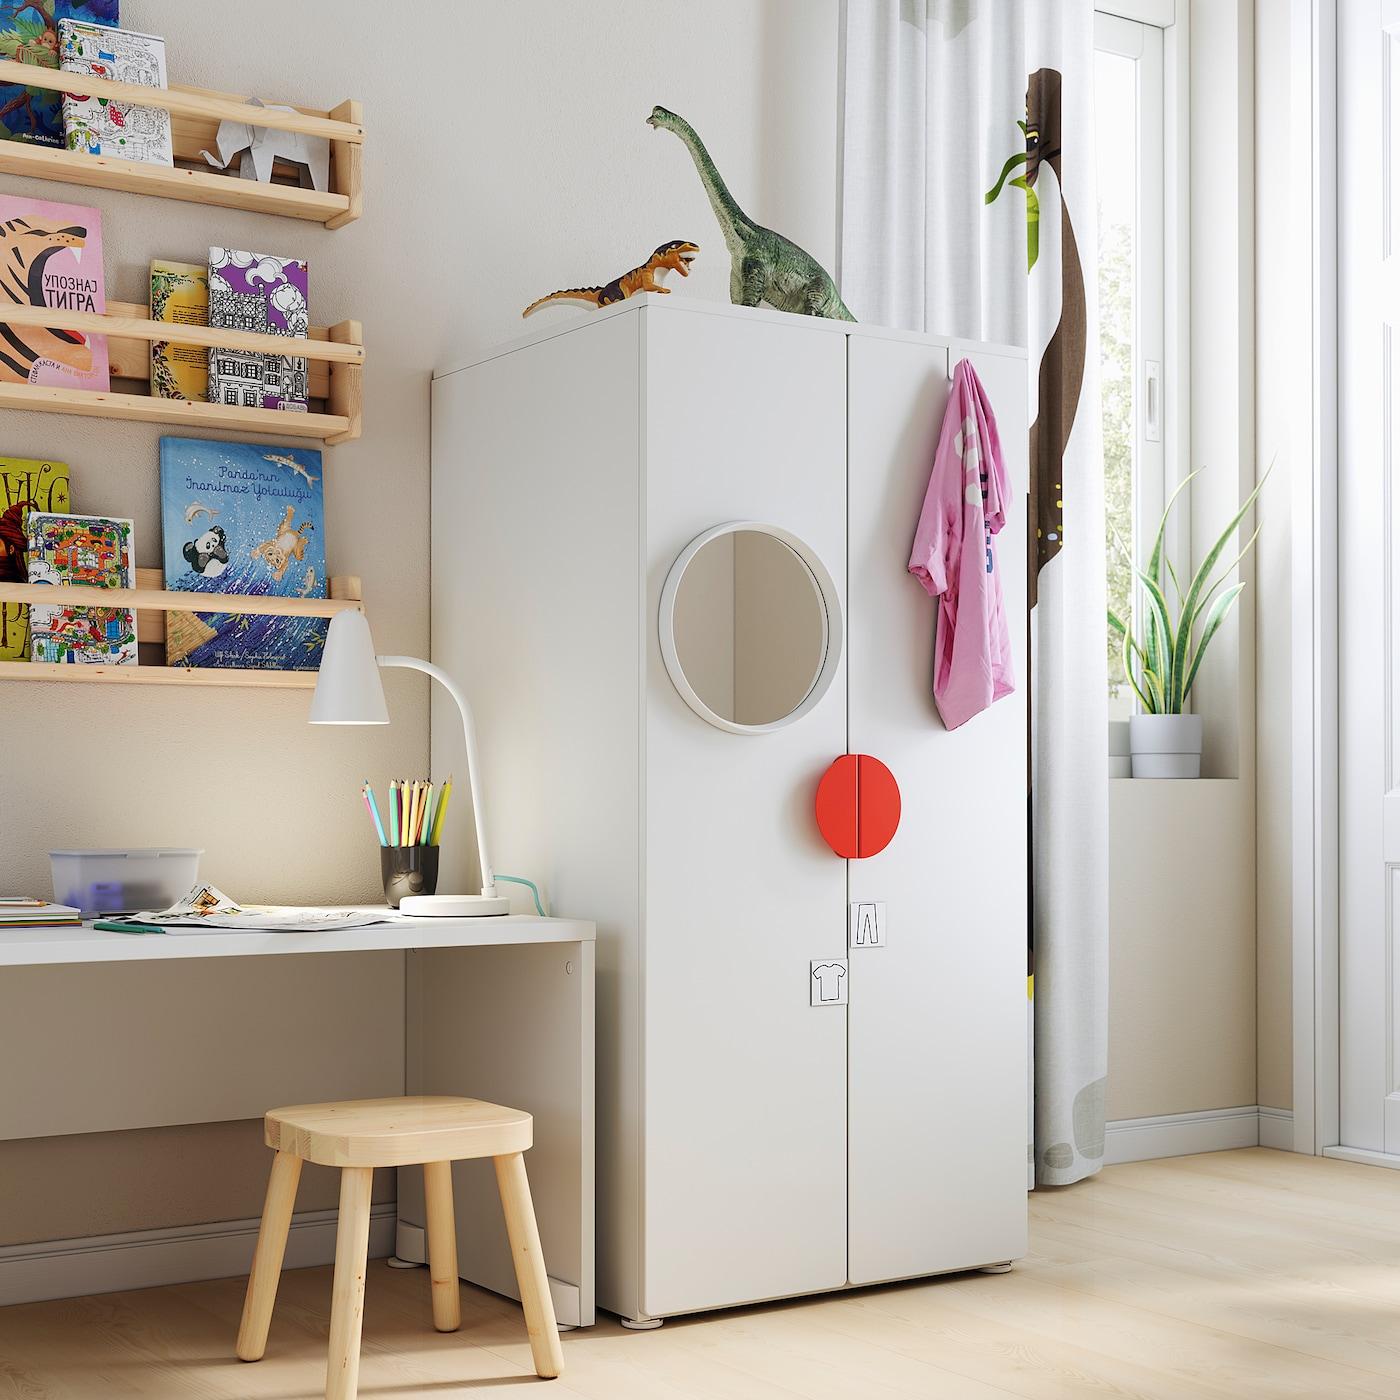 SMÅSTAD / PLATSA خزانة ملابس, أبيض/أبيض, 60x57x123 سم